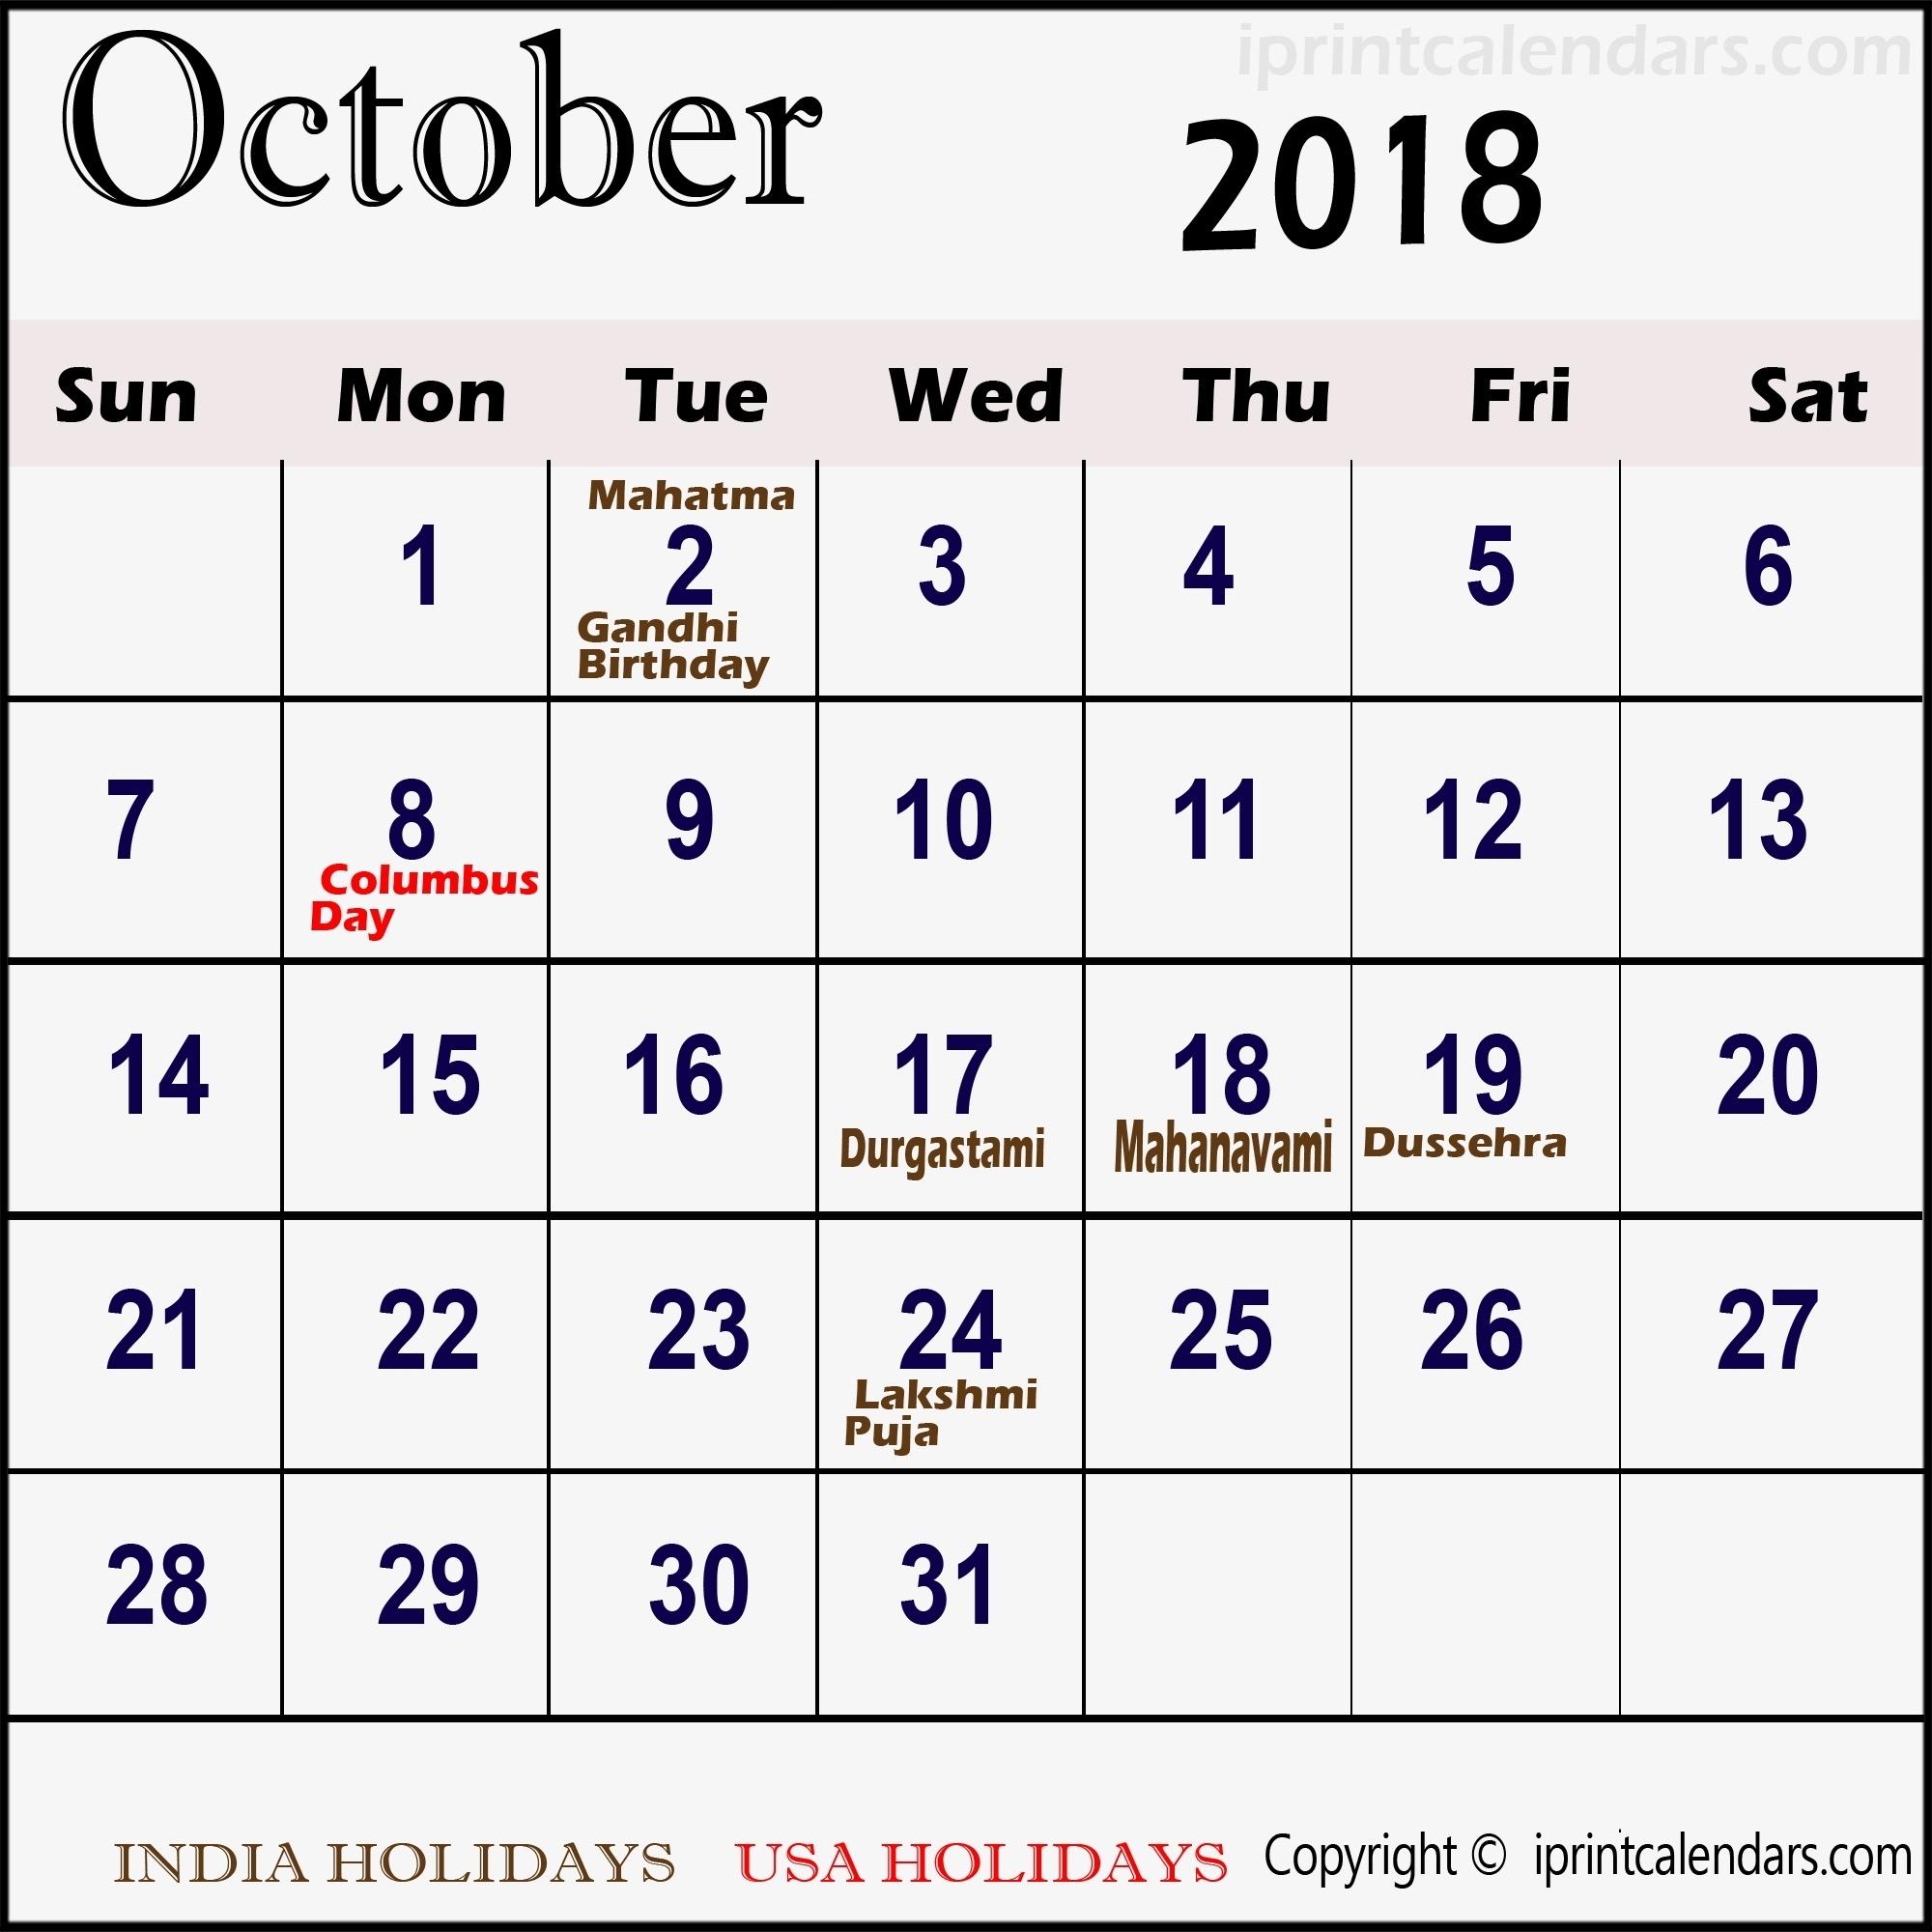 October 2018 Calendar Moon Phases